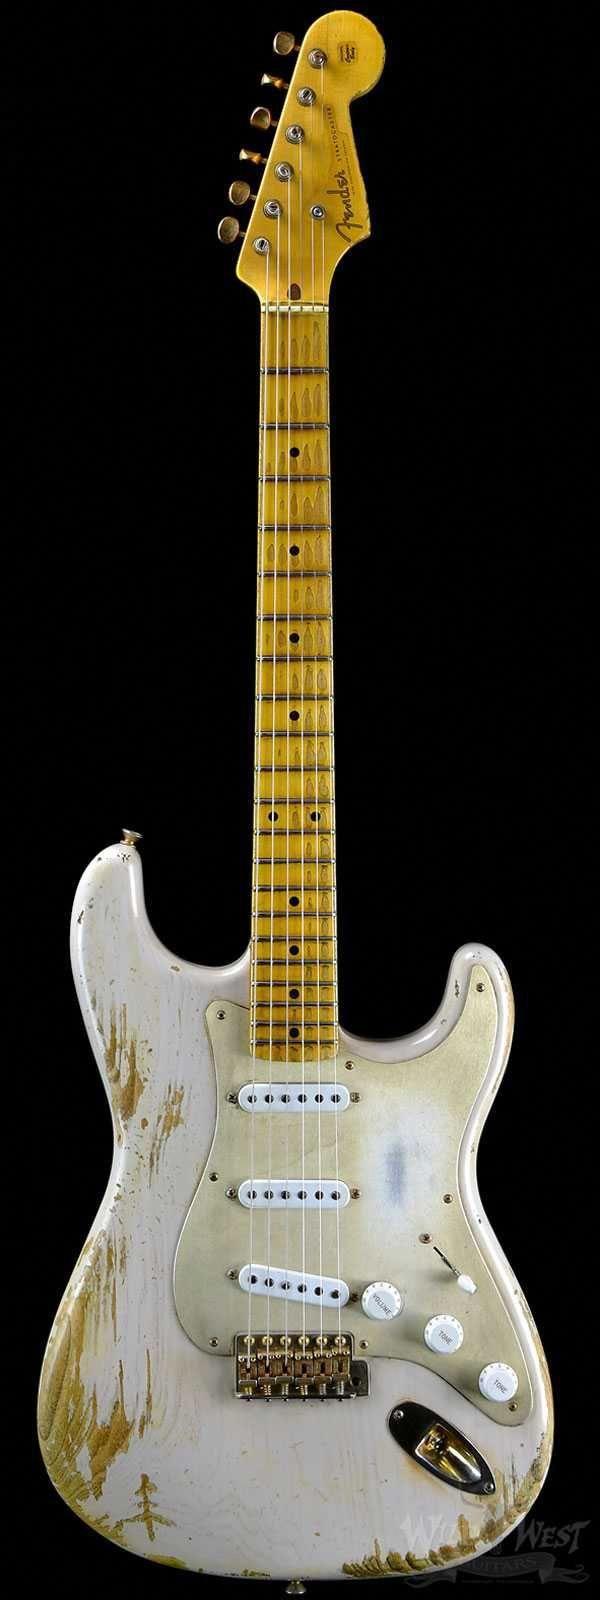 Fender Guitar Electric Telecaster Fender Guitar T Shirts For Men #guitarsarebetter #guitarman #FenderGuitars #fenderguitars